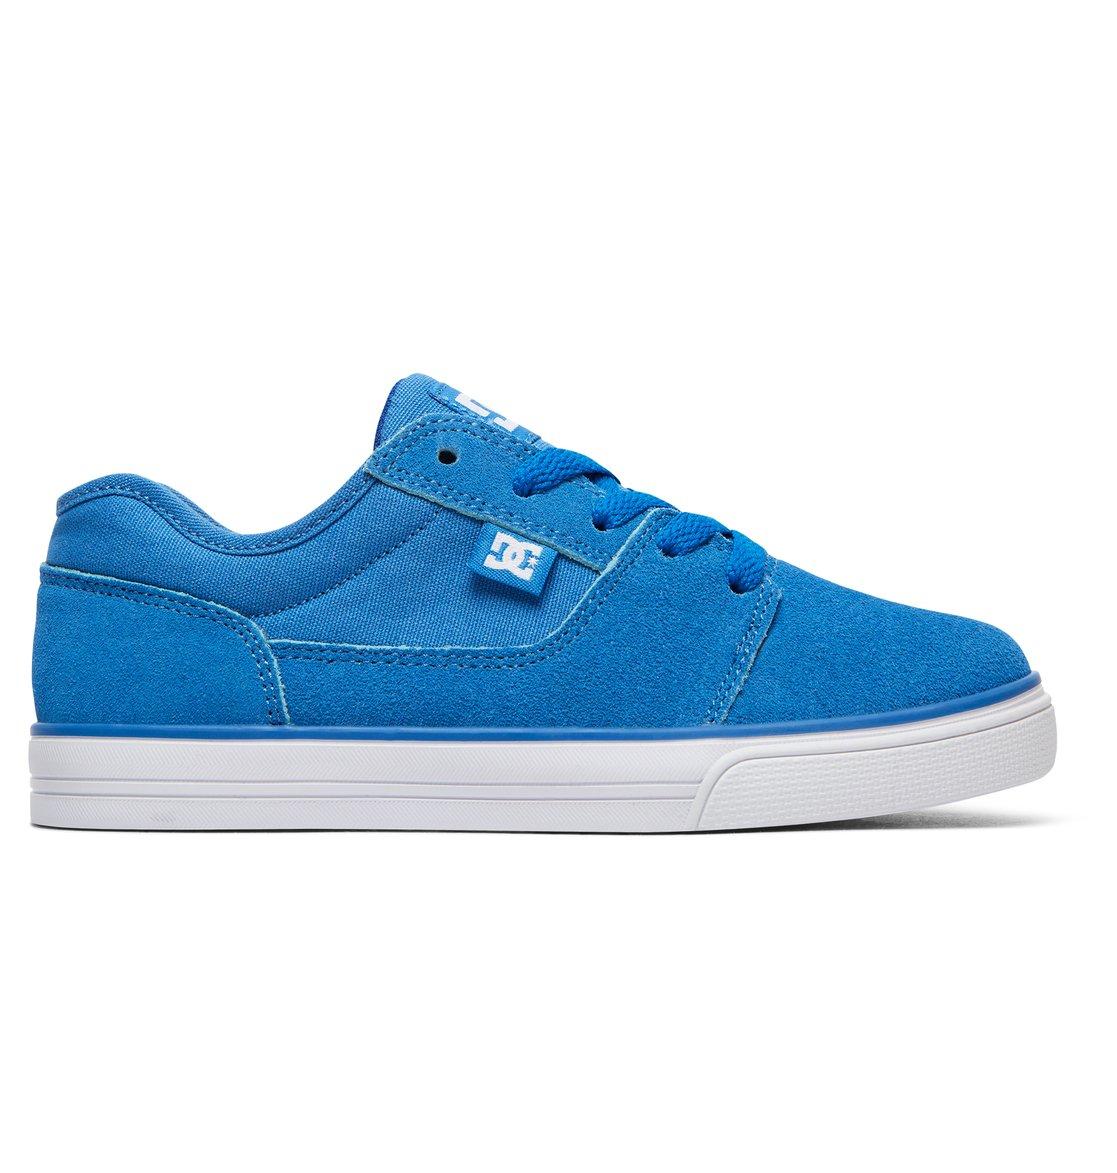 DC Shoes Tonik, Baskets Homme, Bleu (Navy/Bright Blue Nvb), 39 EU